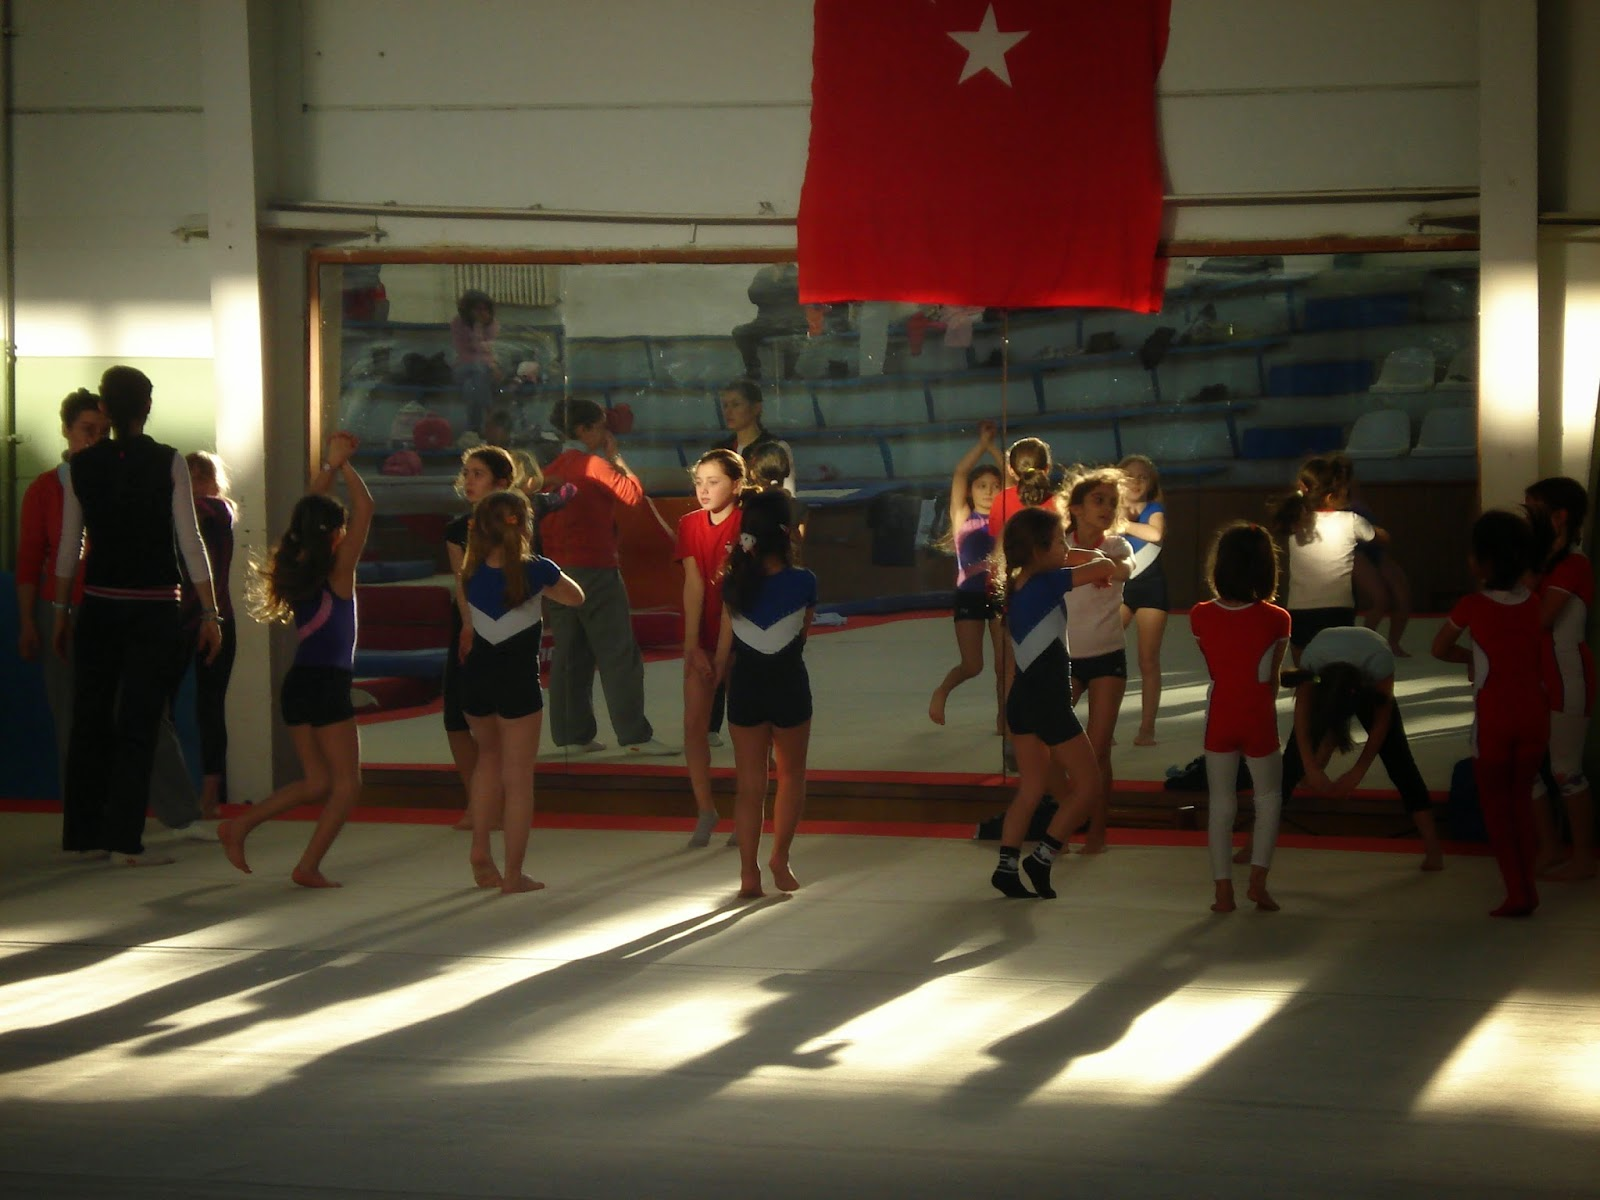 gymnastics class for kids